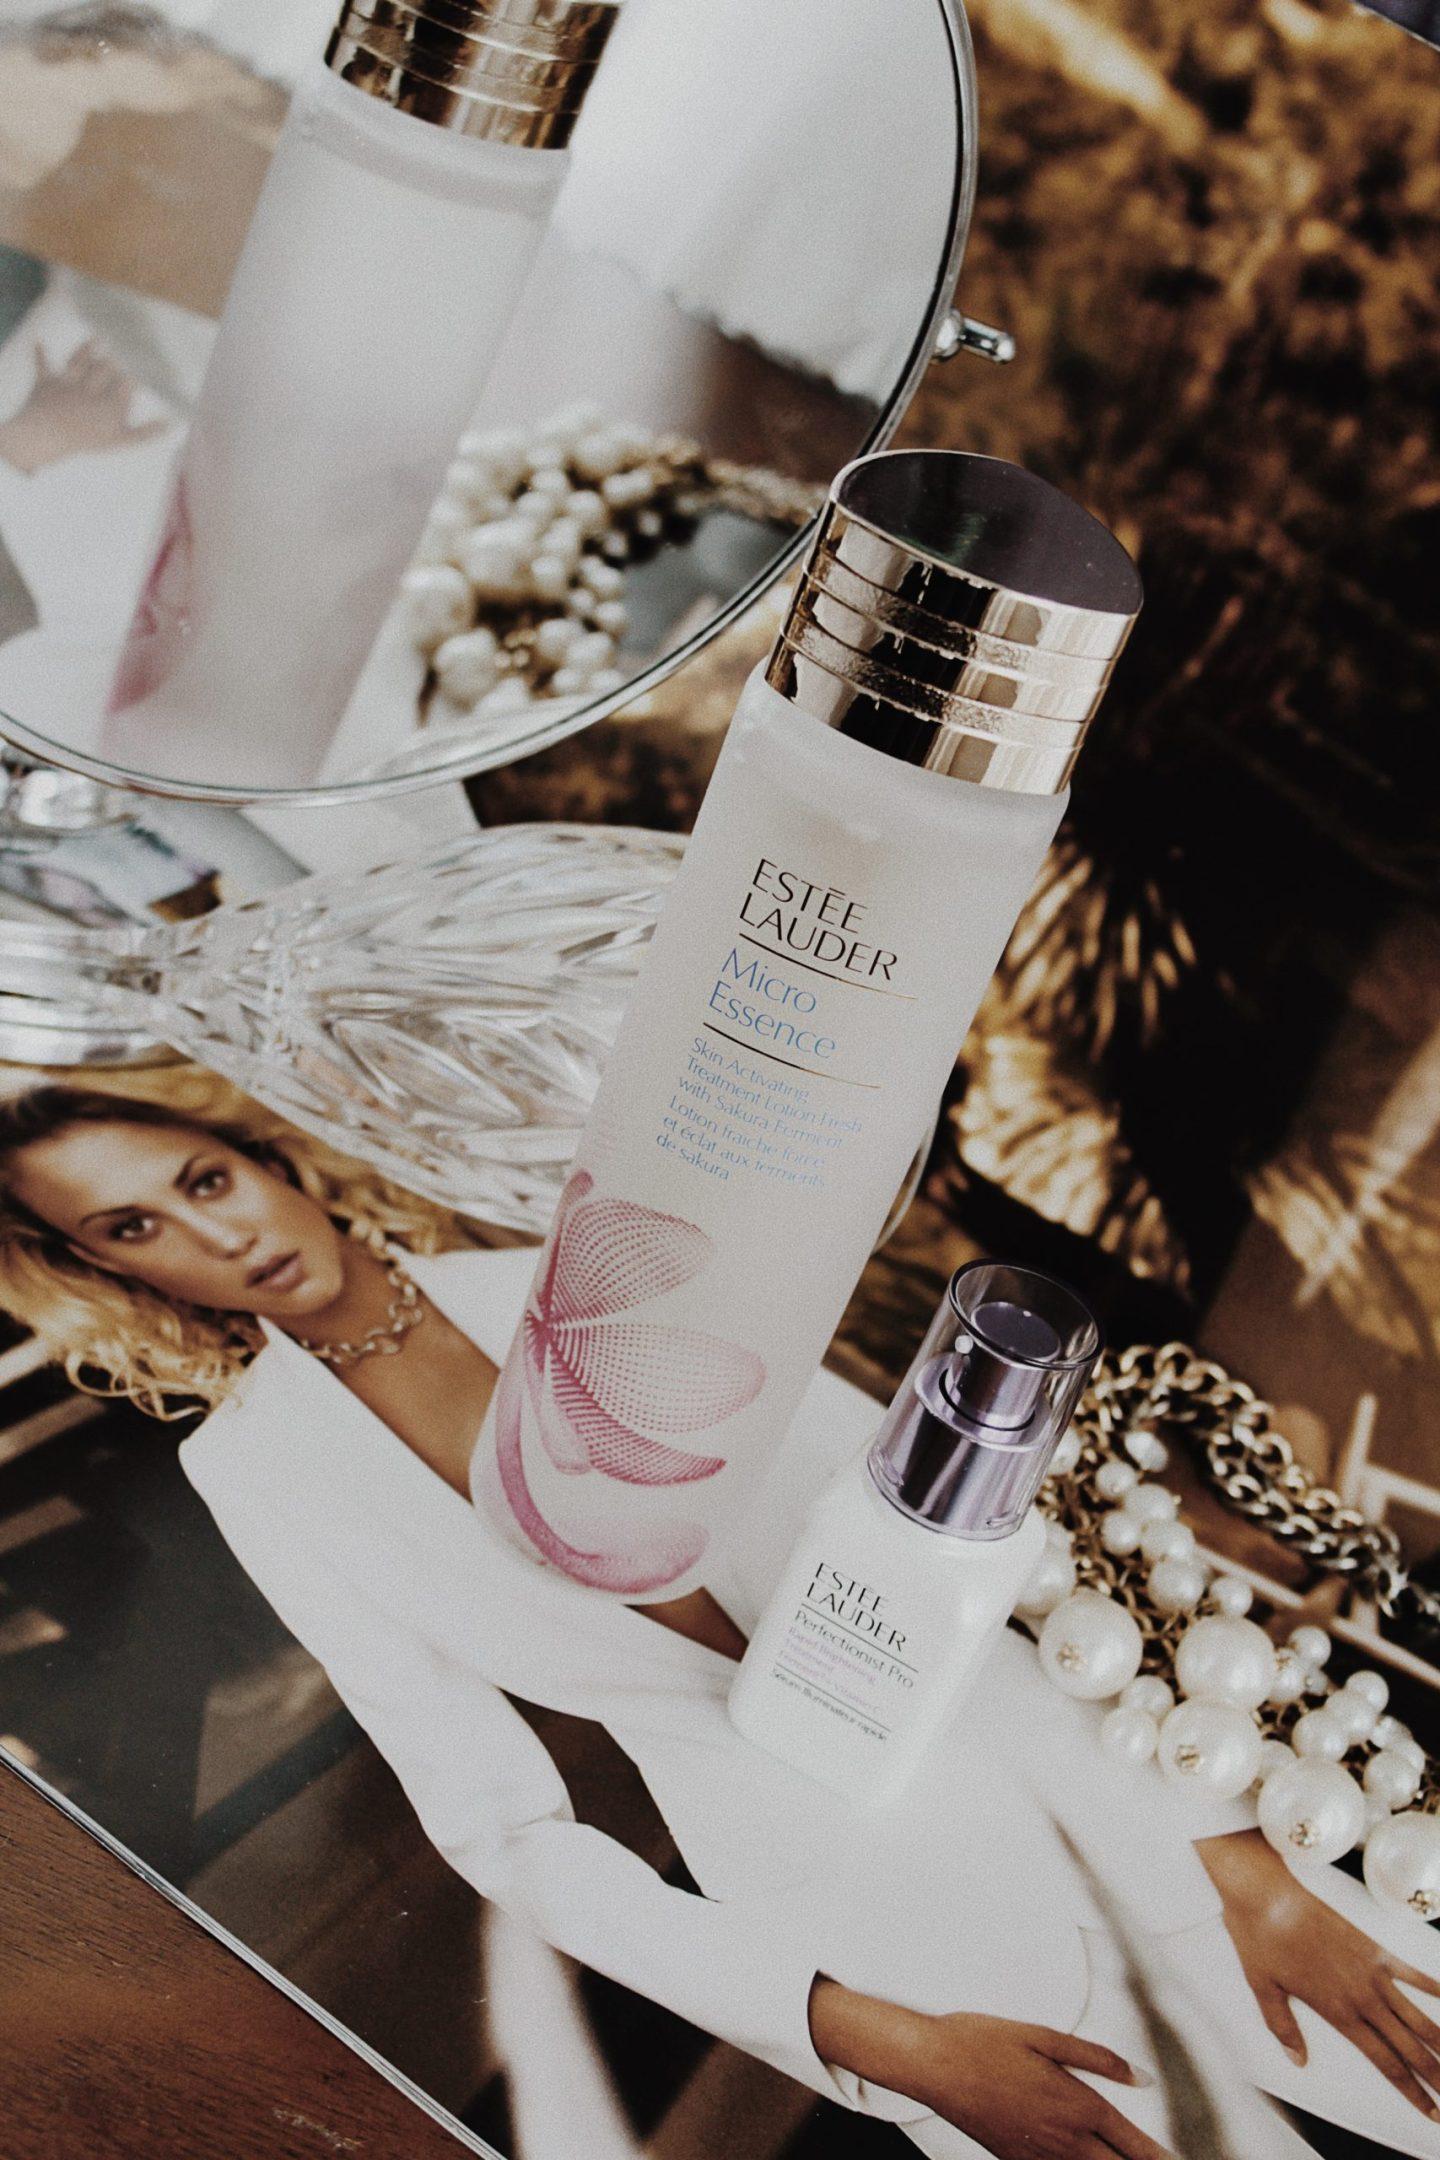 Estee Lauder Perfectionist Pro Rapid Brightening Treatment & Micro Essence Skin Activating Treatment Lotion Fresh with Sakura Ferment